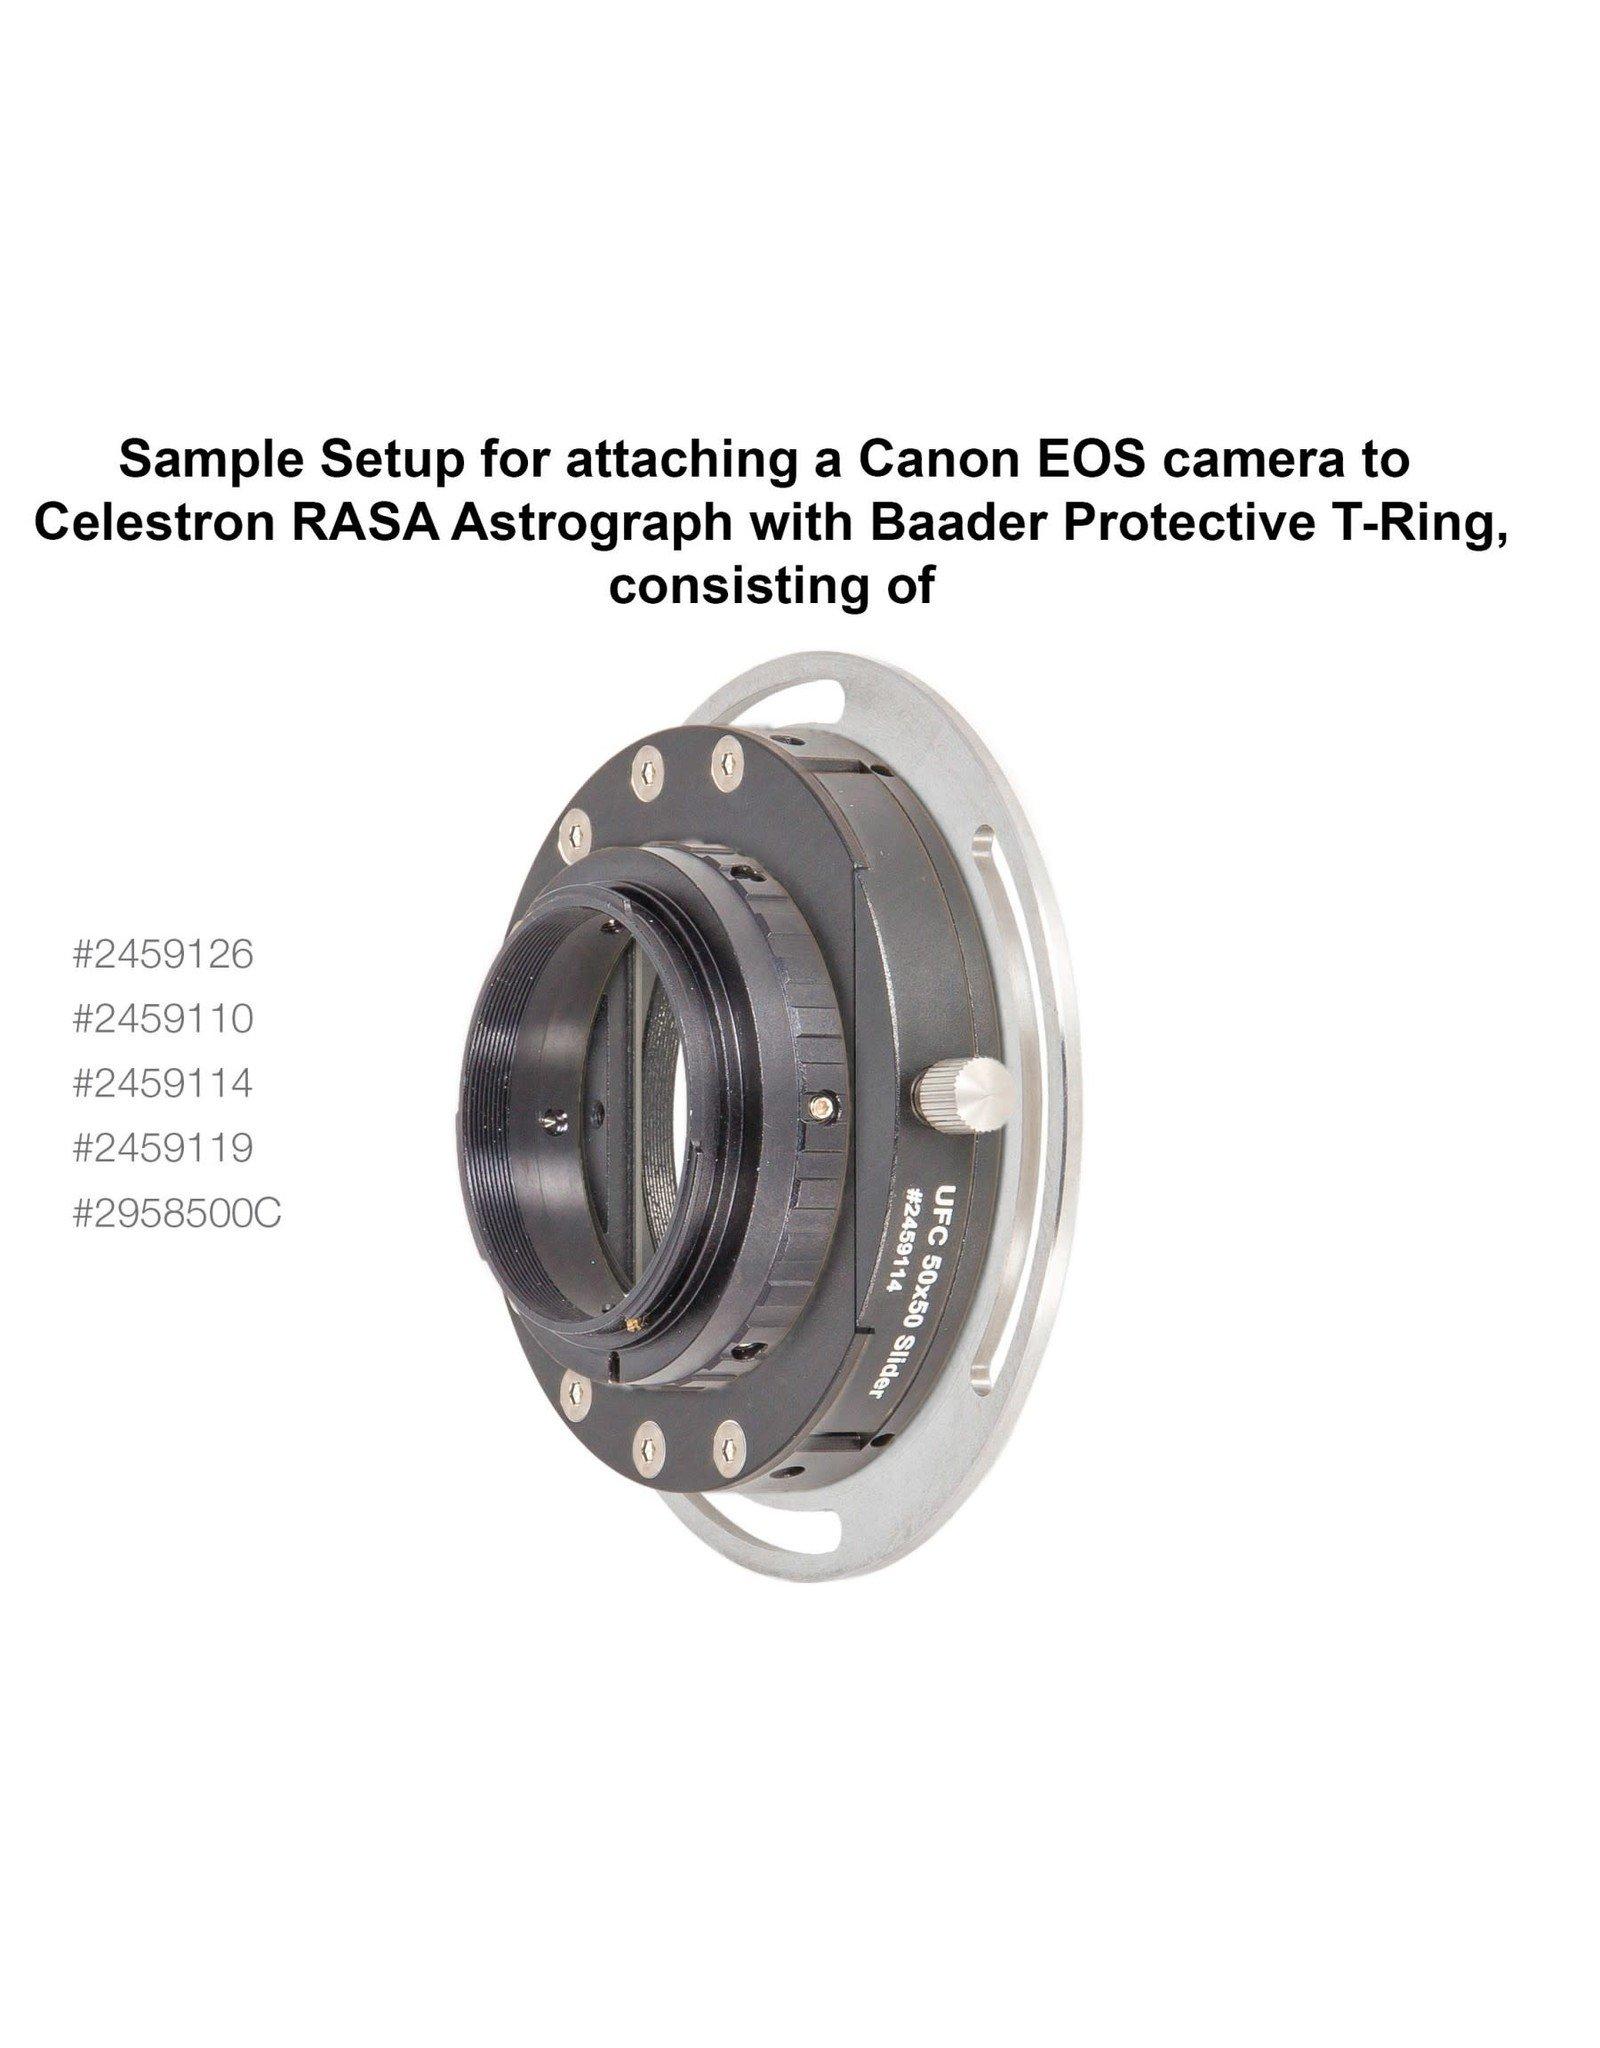 "Baader Planetarium Baader UFC S70 11"" RASA Telescope-Adapter (optical height: 3 mm)"